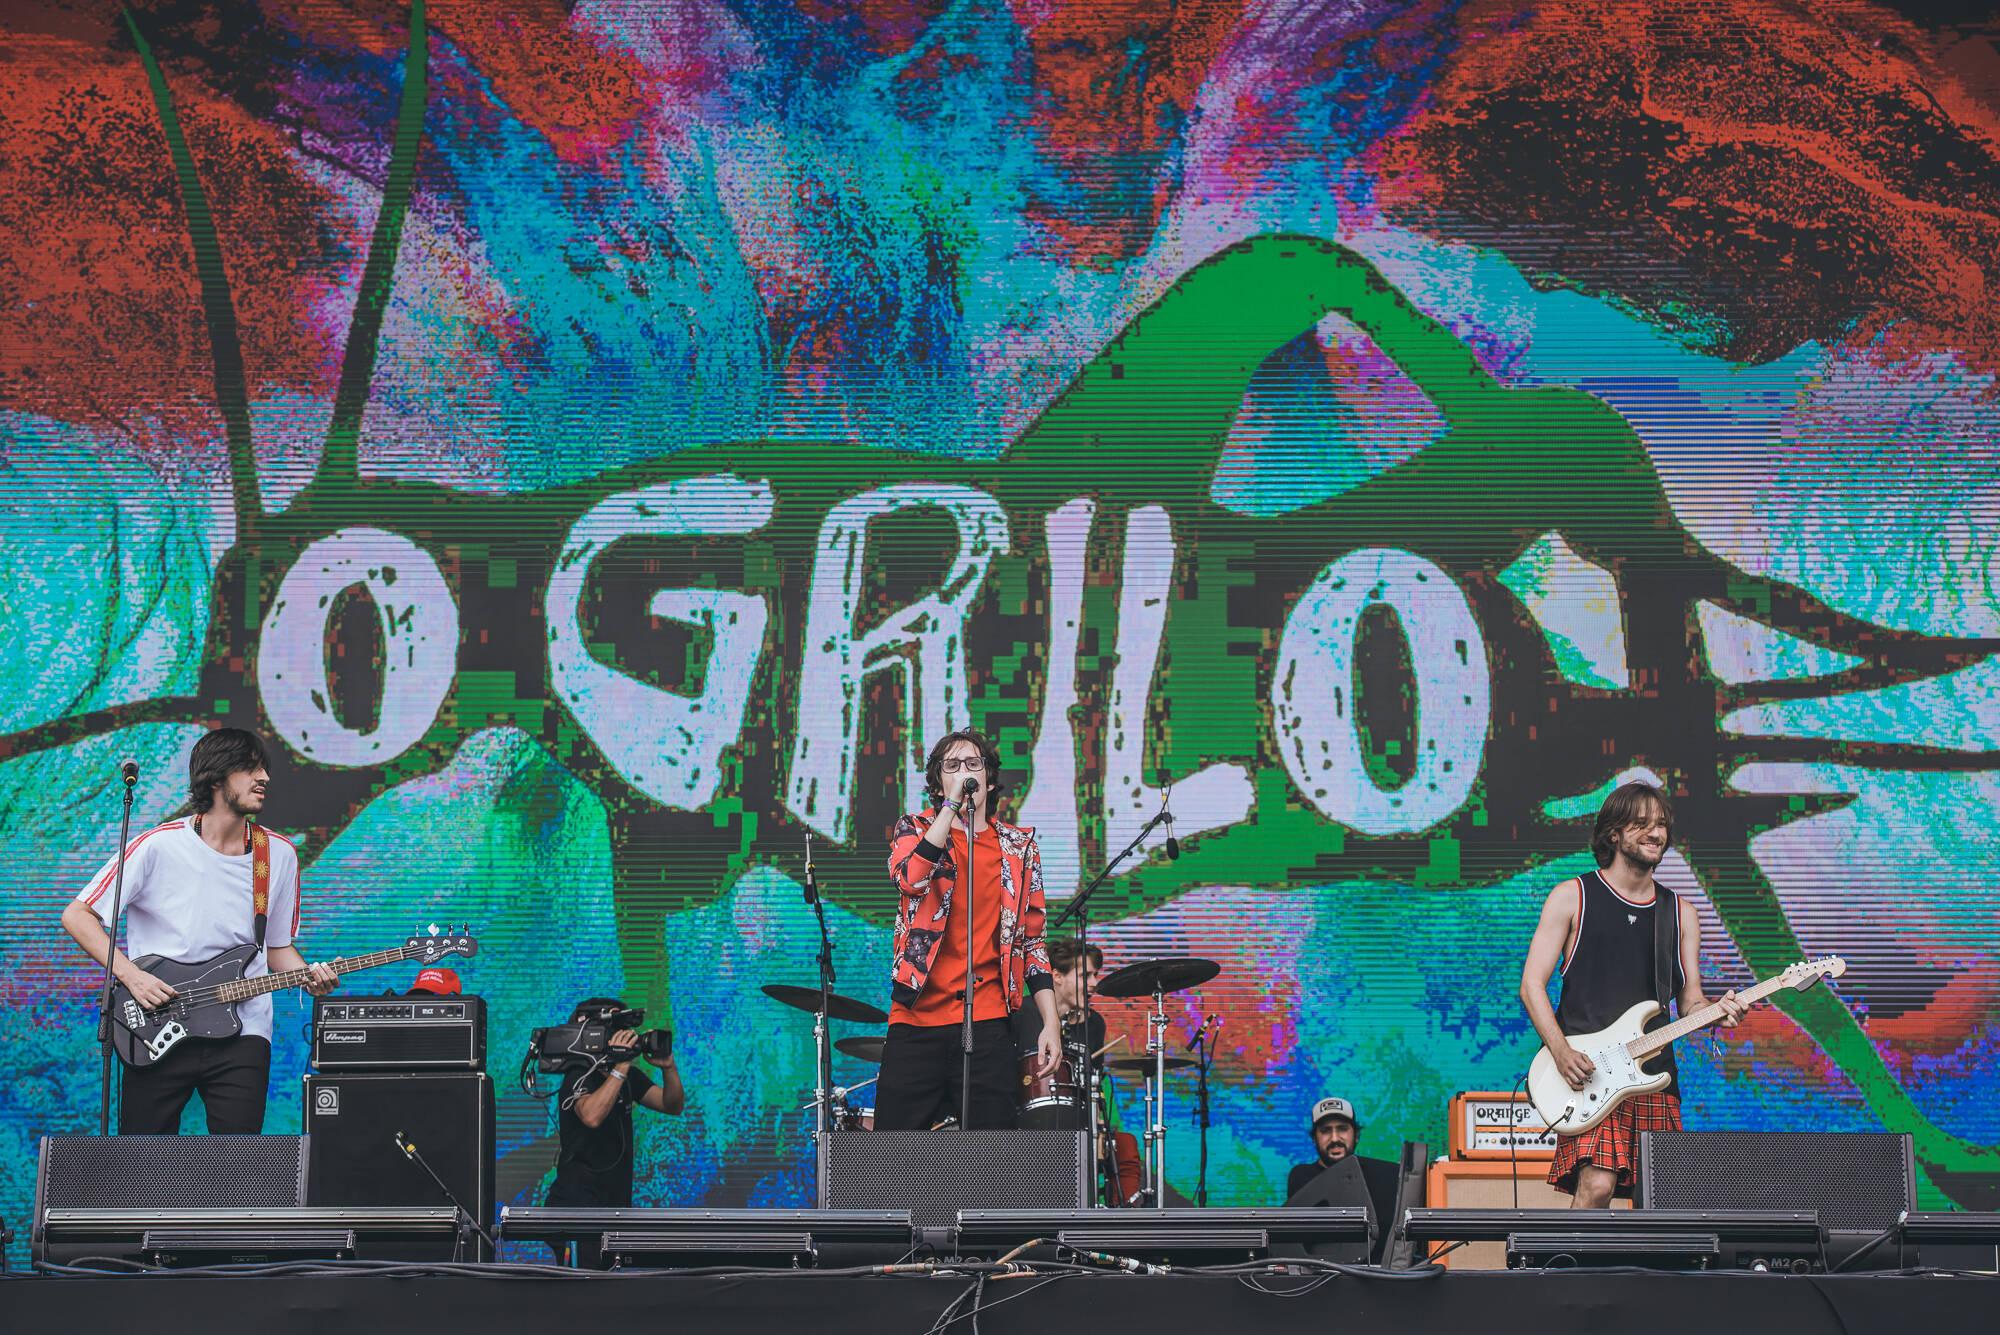 Banda O Grilo no Palco Onix - Lollapalooza 2019. Foto: Divulgação/MRossi